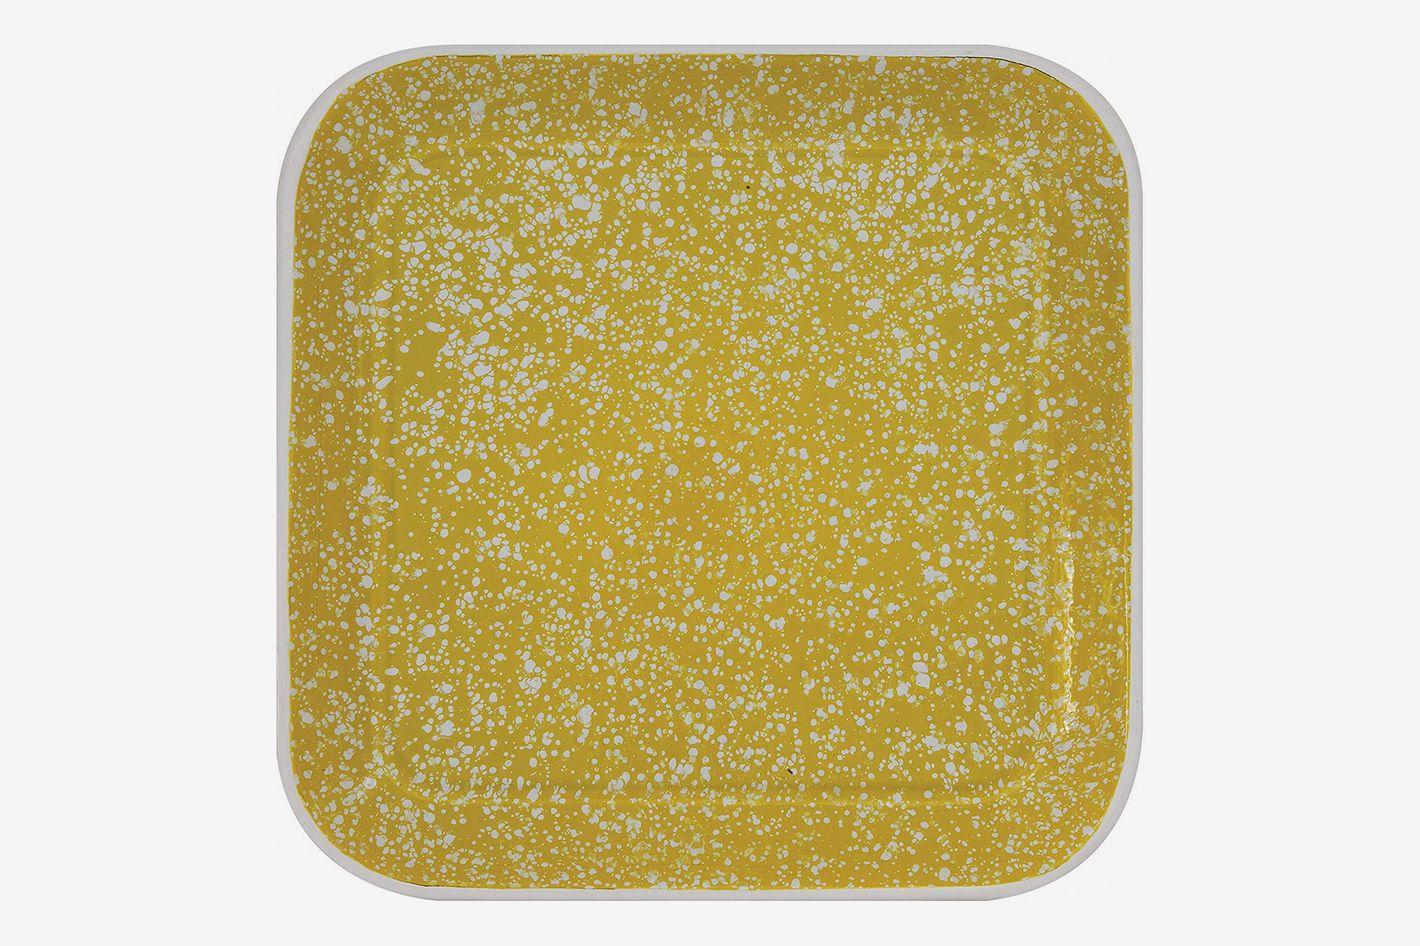 Creative Co-Op Square Yellow Splatterware Tin Platter